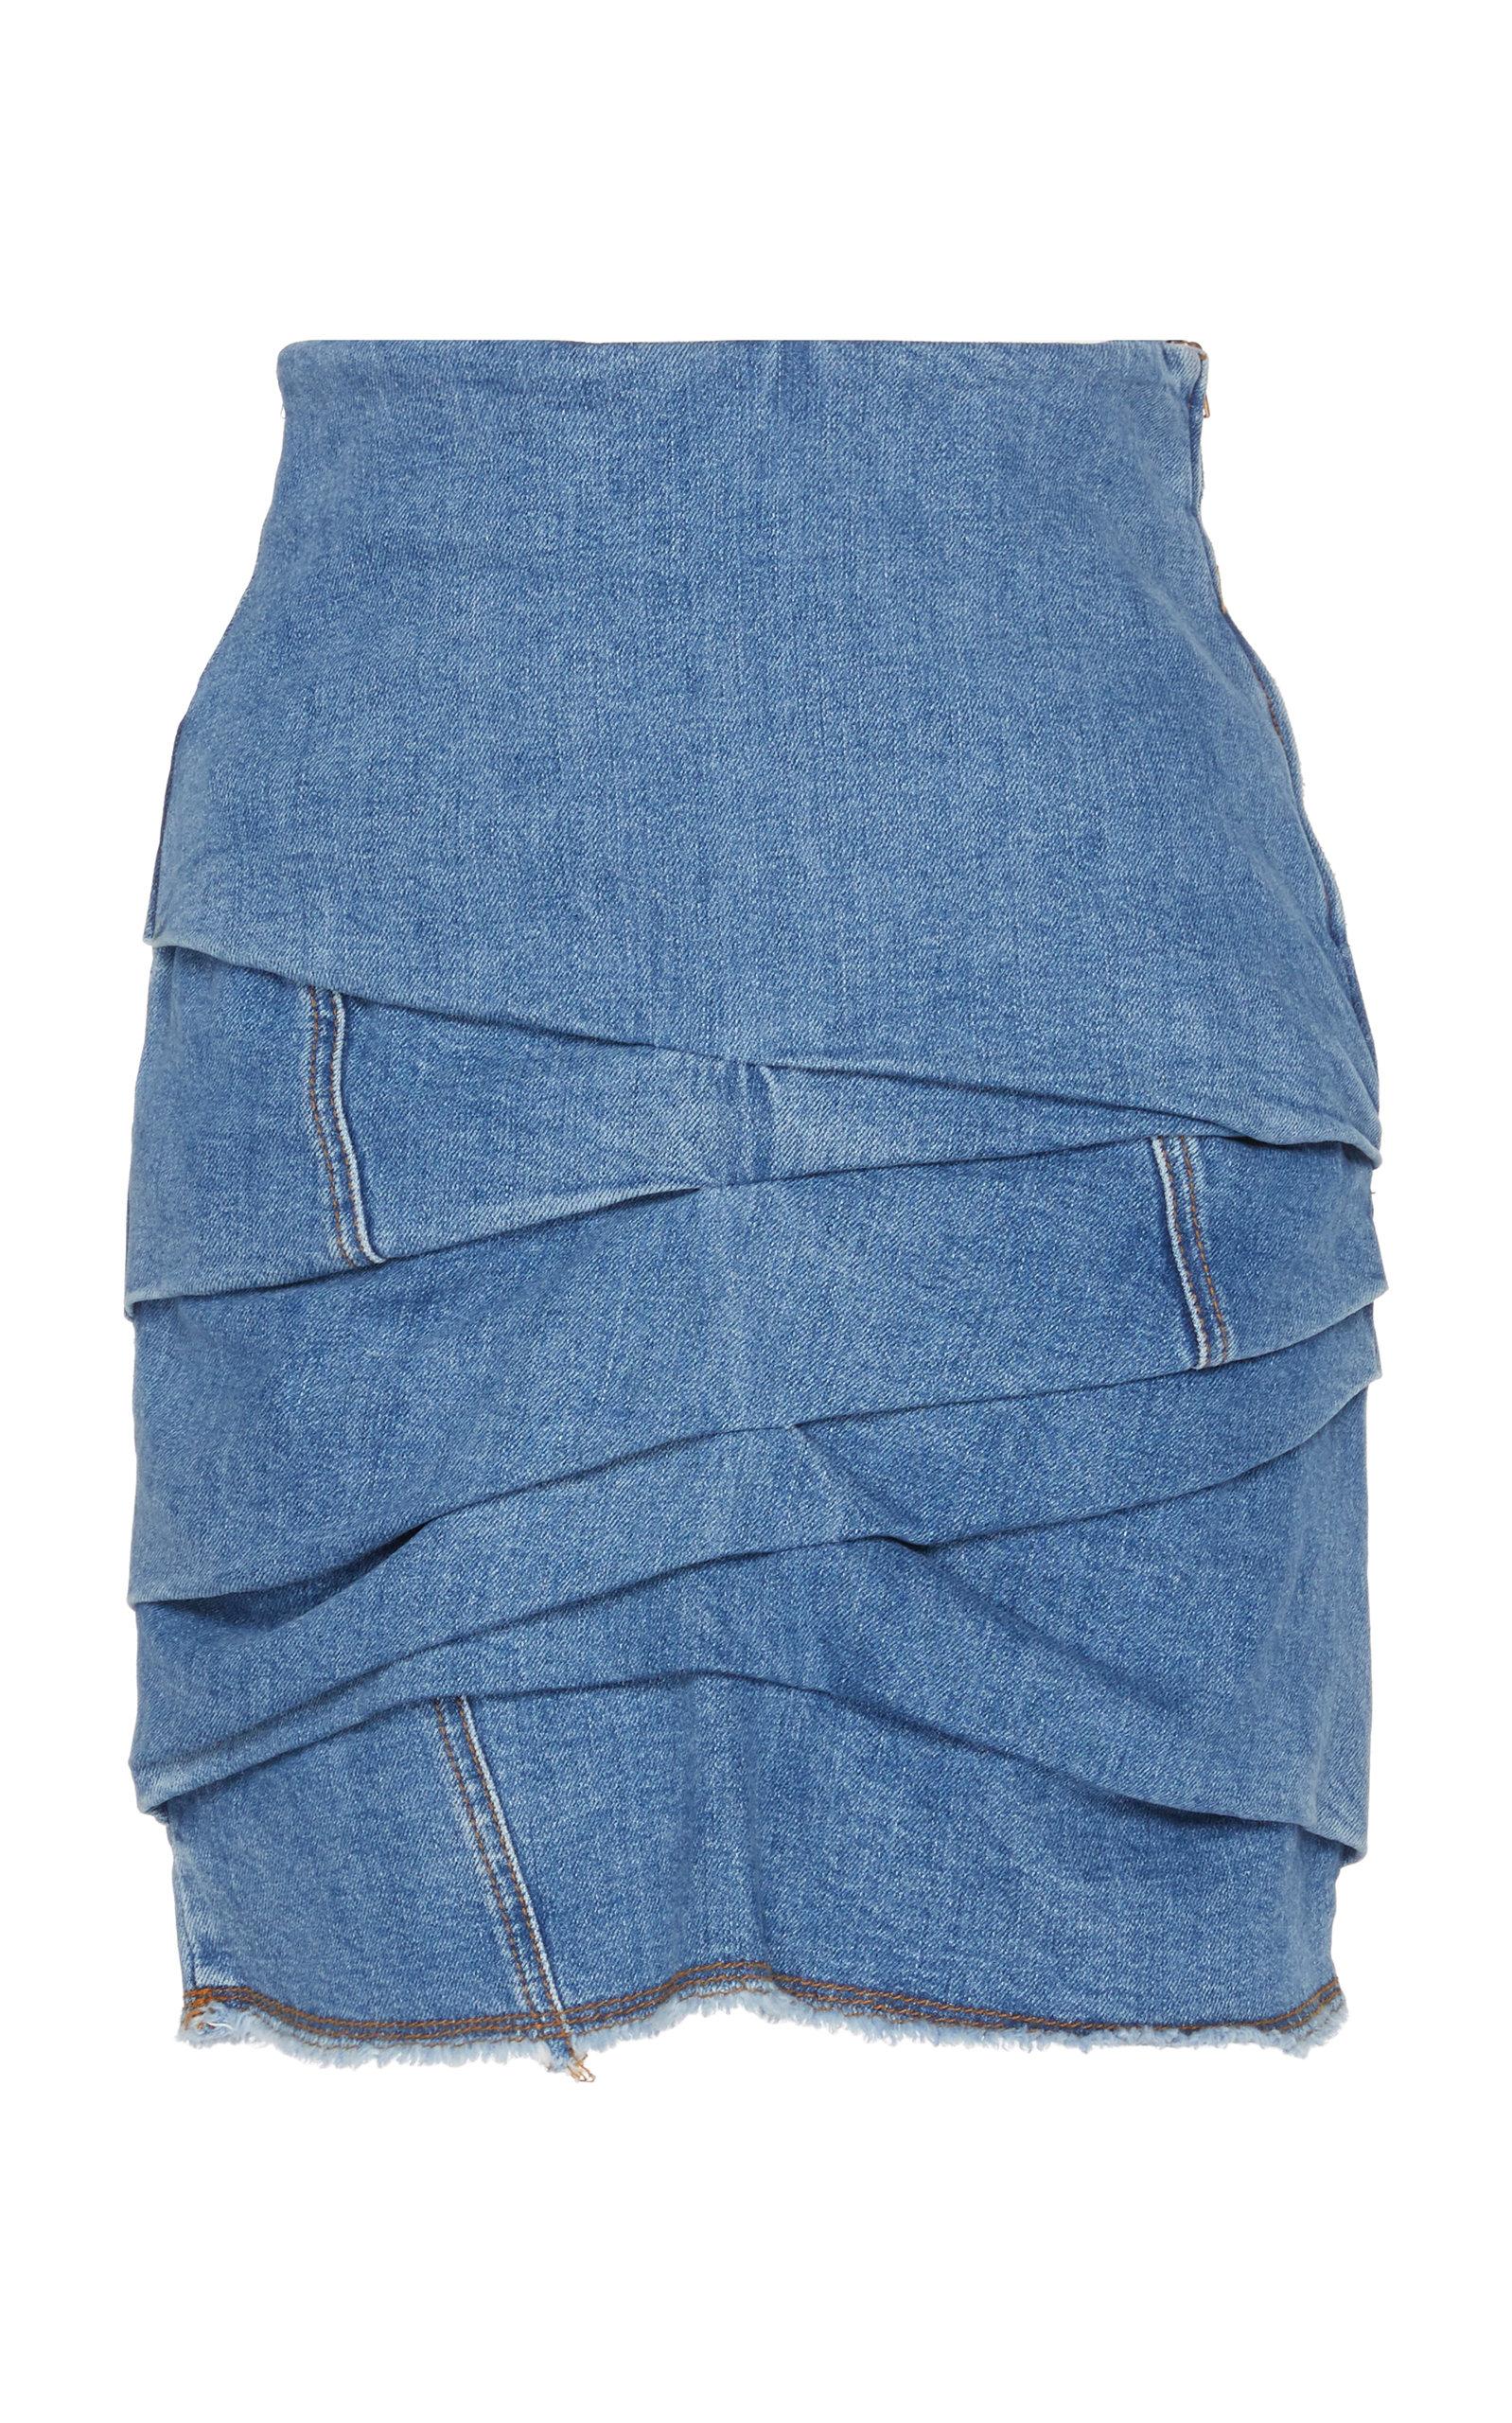 cbd68d0ca Distressed Layered Denim Skirt by Philosophy di Lorenzo Serafini ...